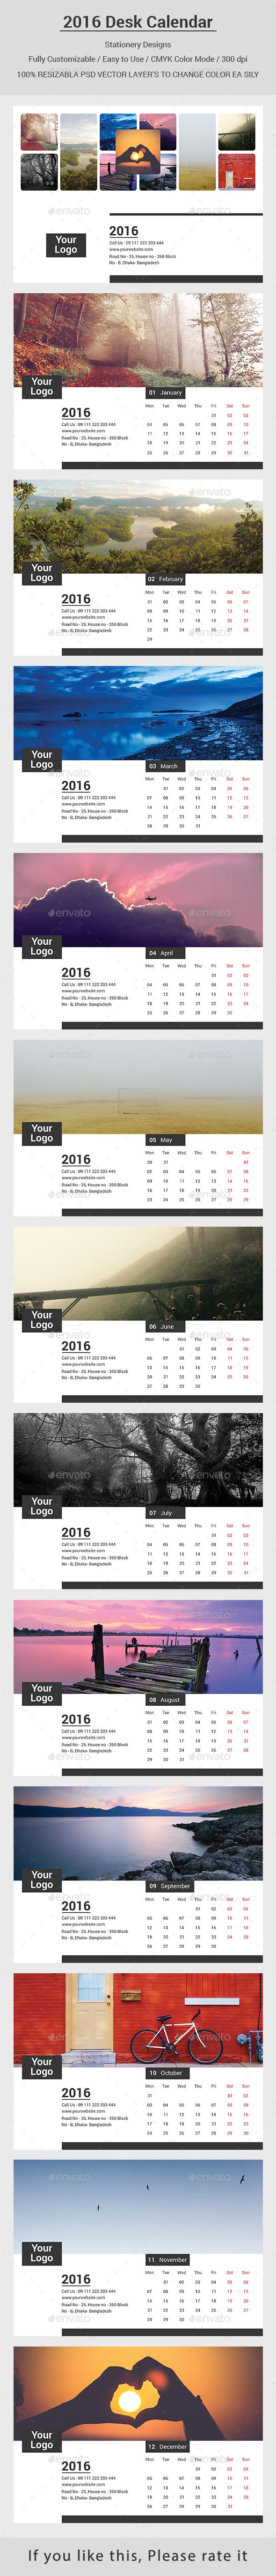 2016 Desk Calendar Design More